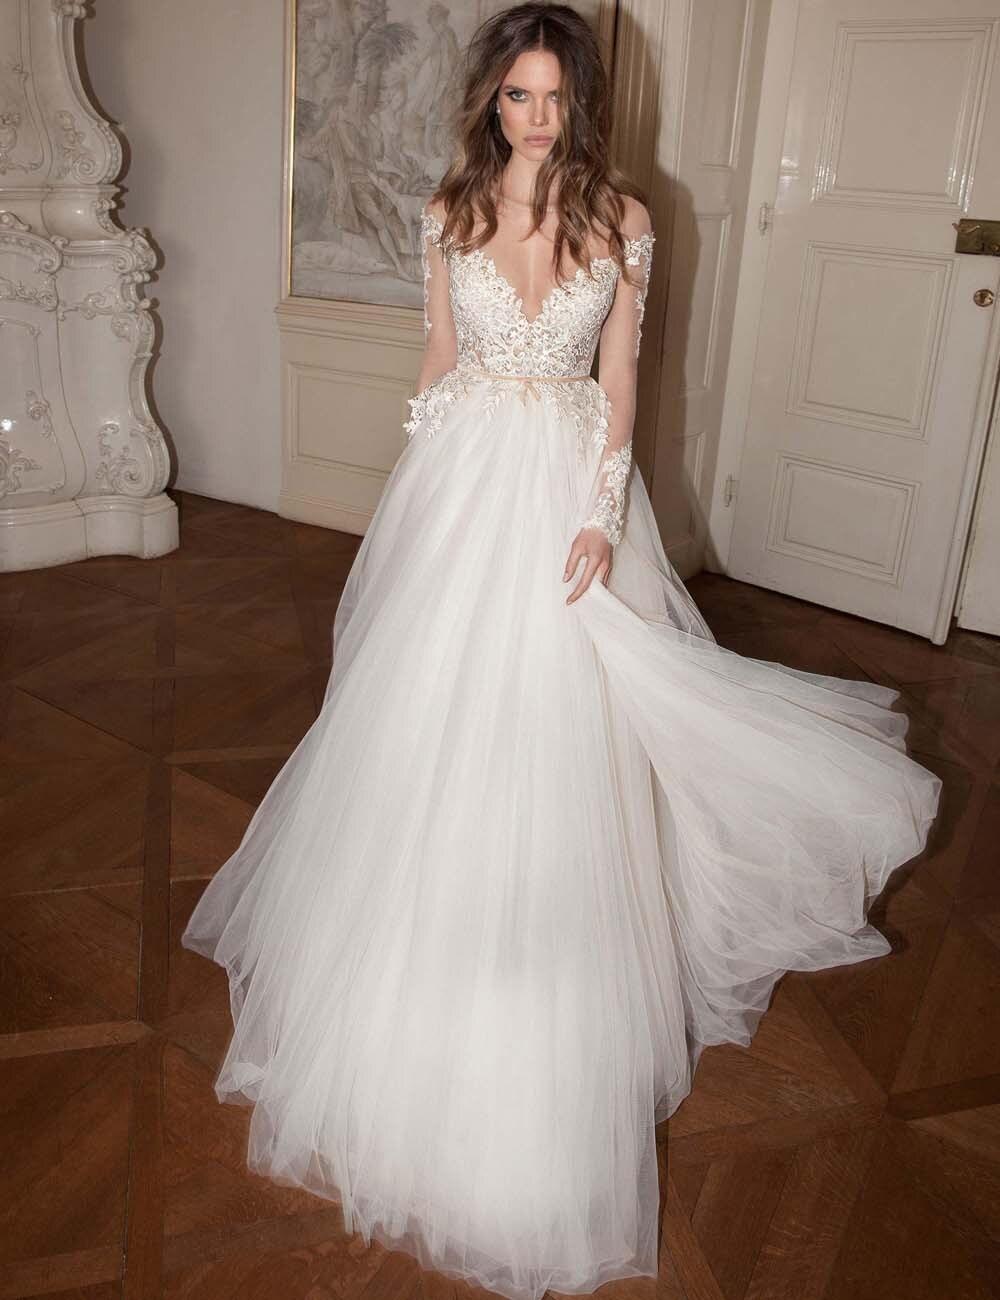 2020 Sexy Fall Backless Wedding Dresses With Long Sleeves Appliques Tulle Floor Length Sheer Neck Vestidos De Novia Bridal